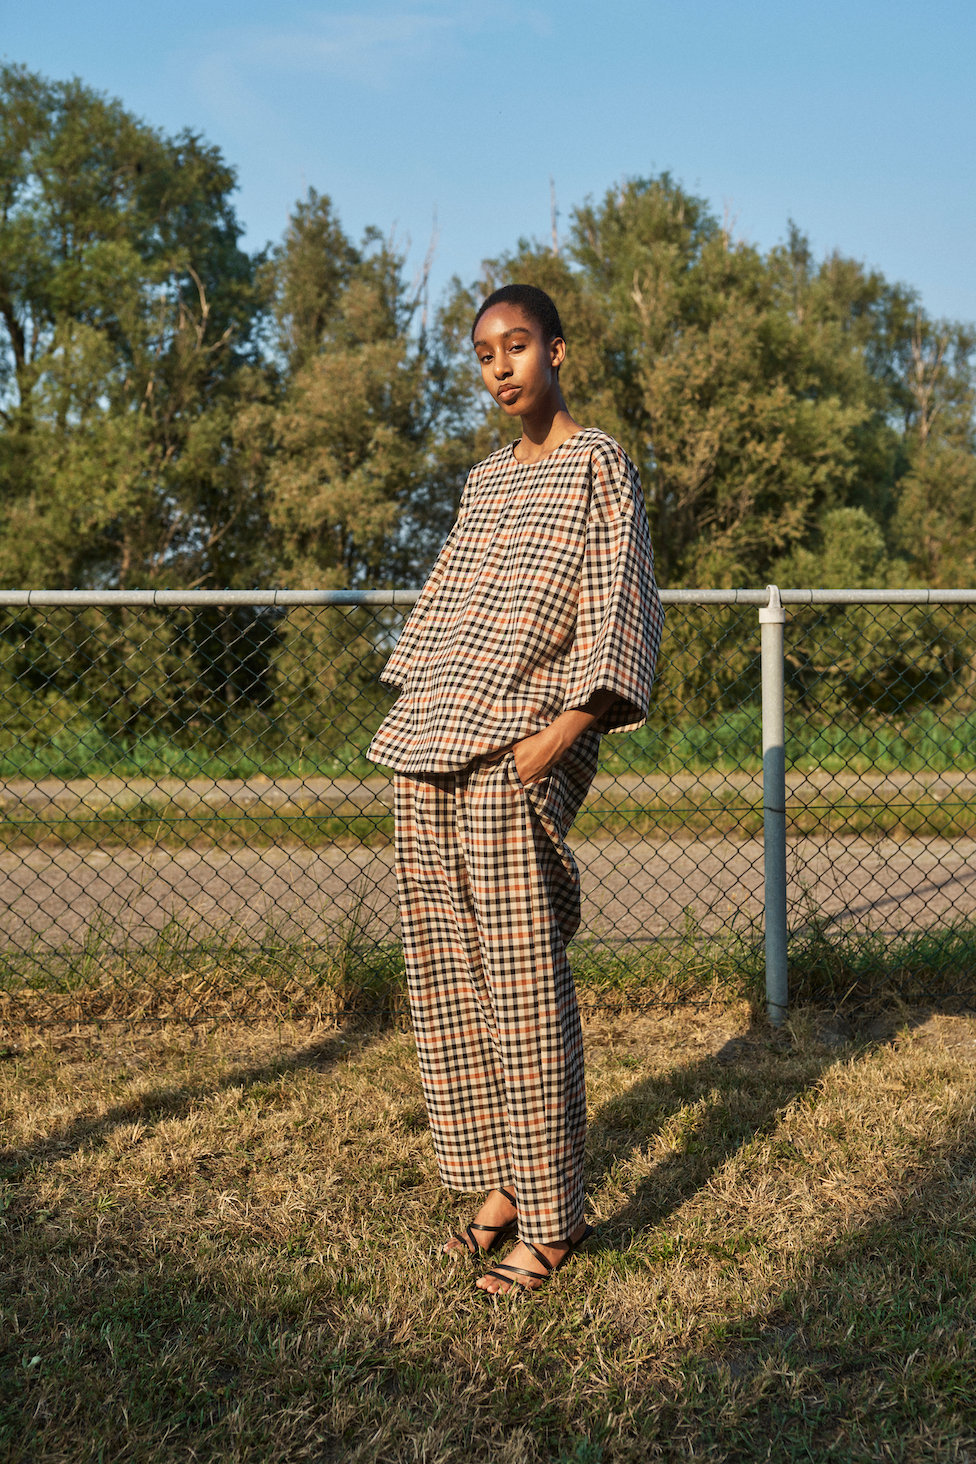 Valerie Ntantu_Latoyah_Pim van Baalen 2.